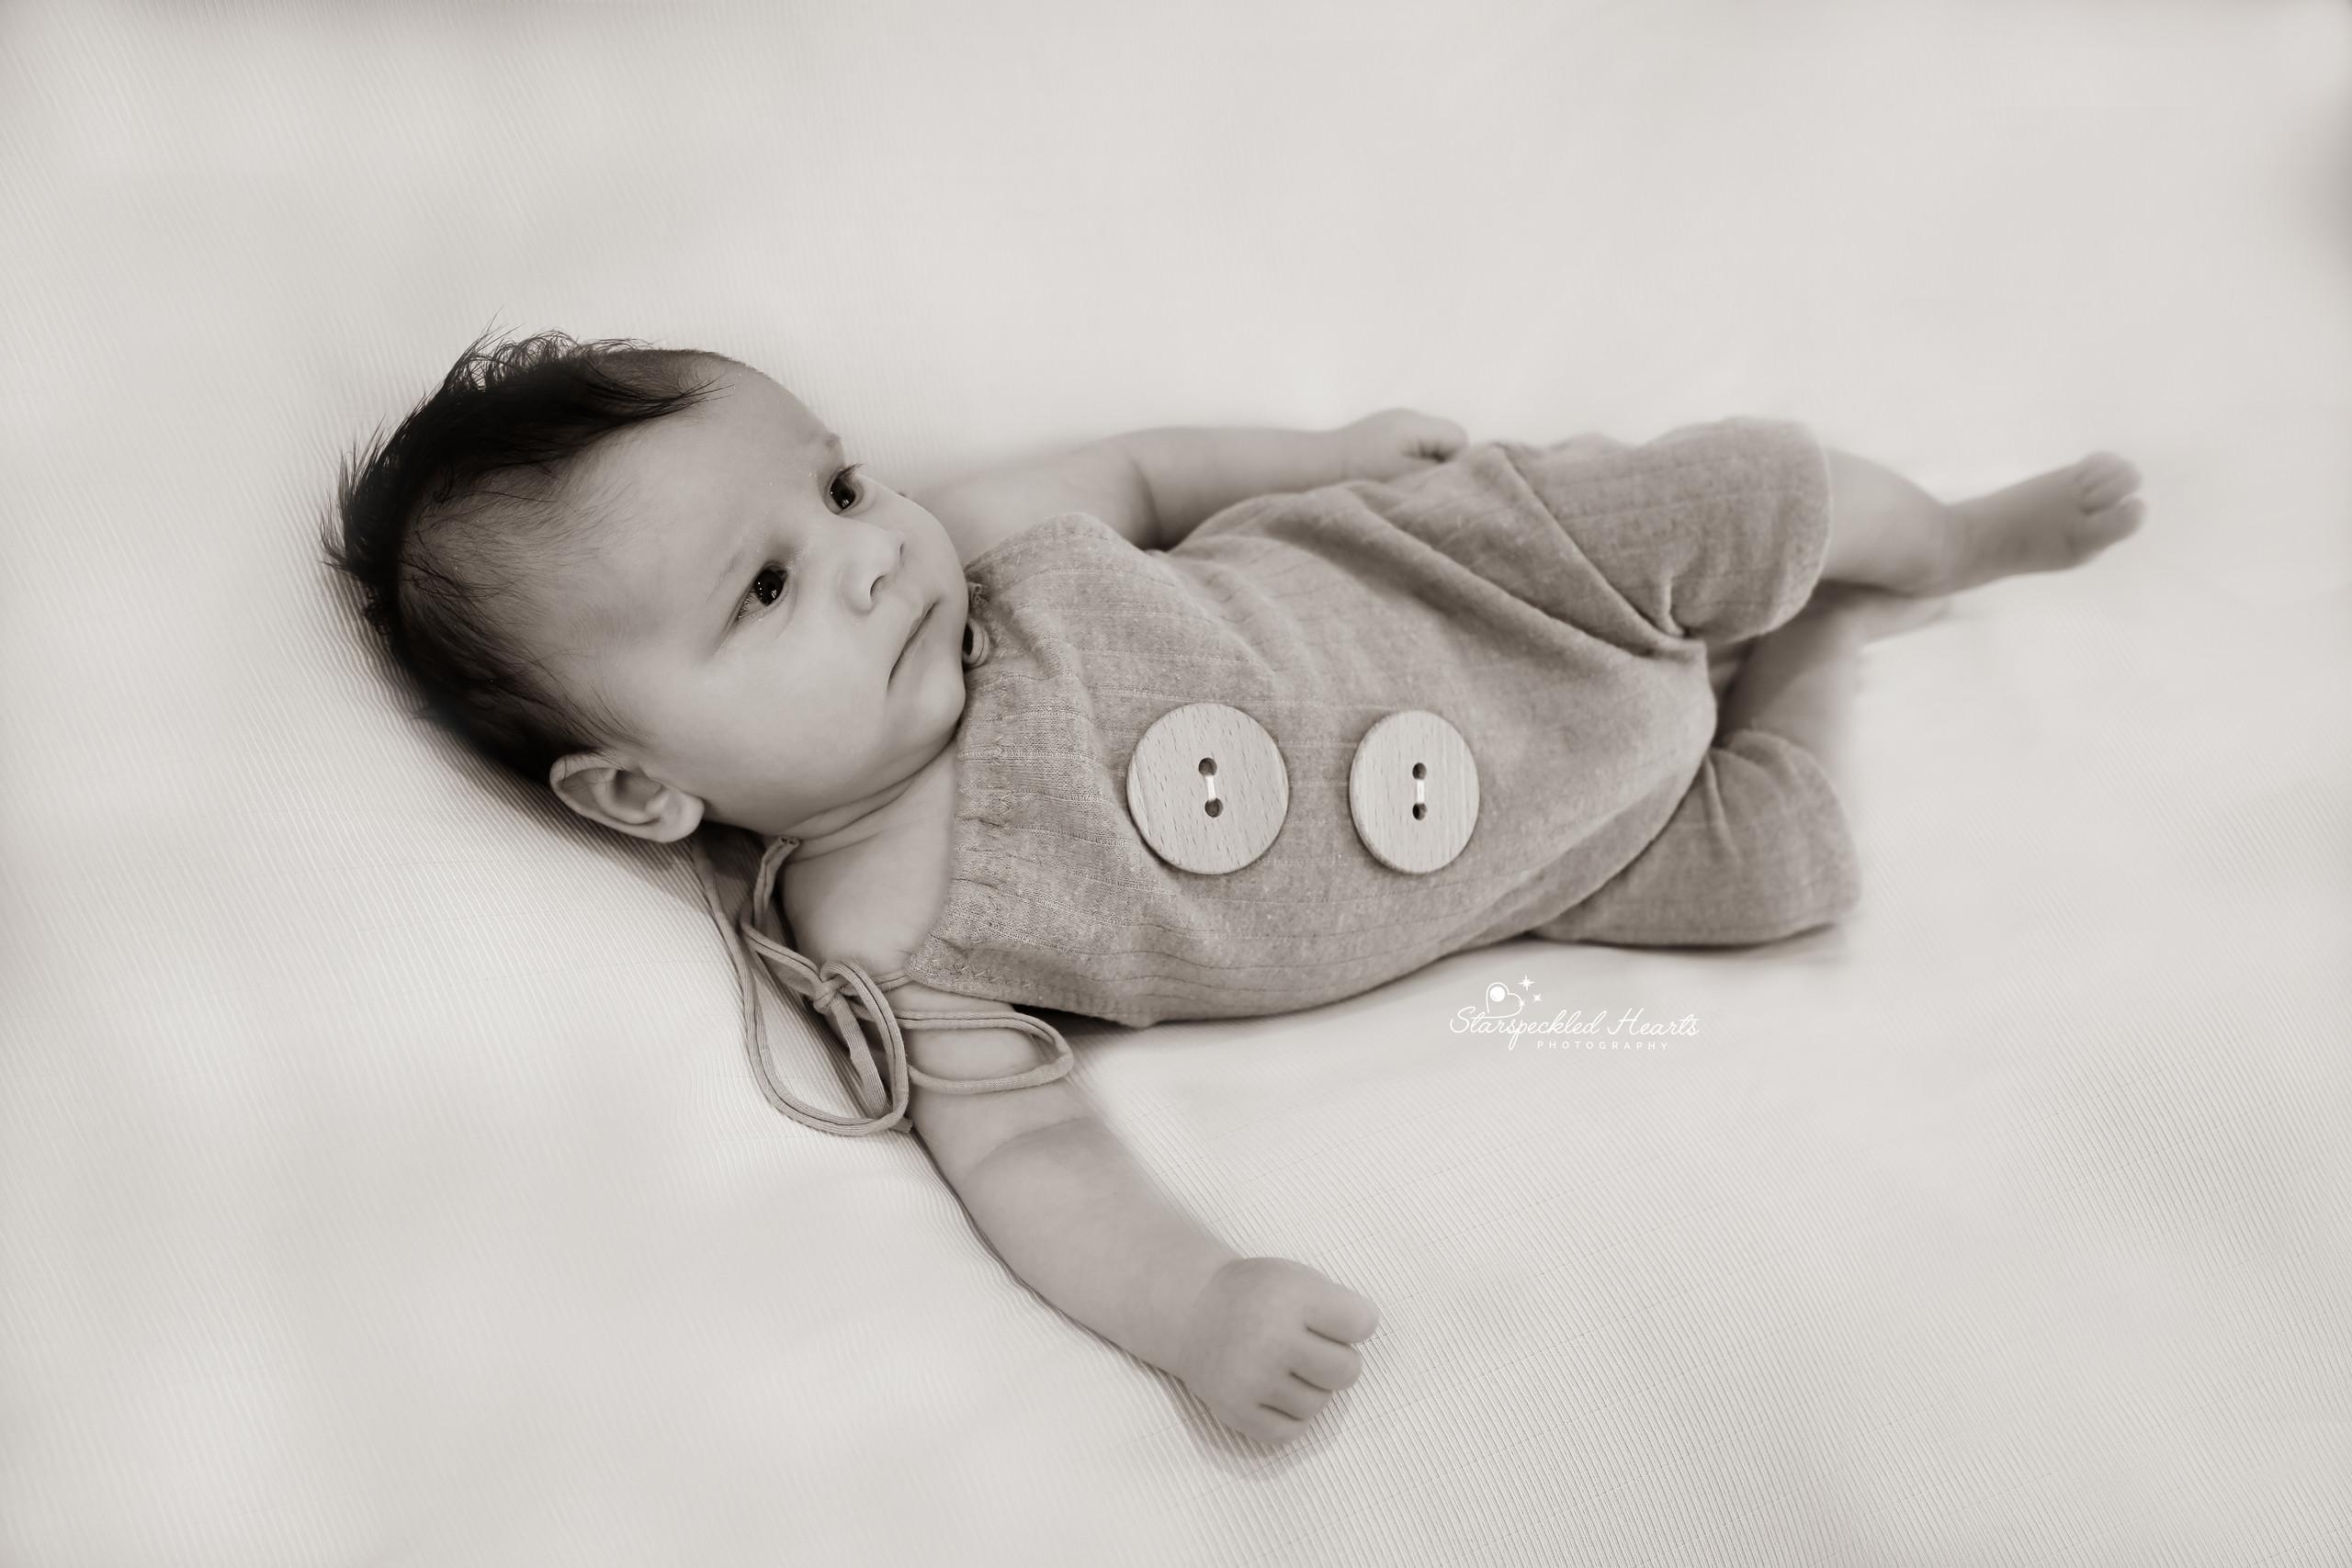 cute baby boy lying on a white blanket